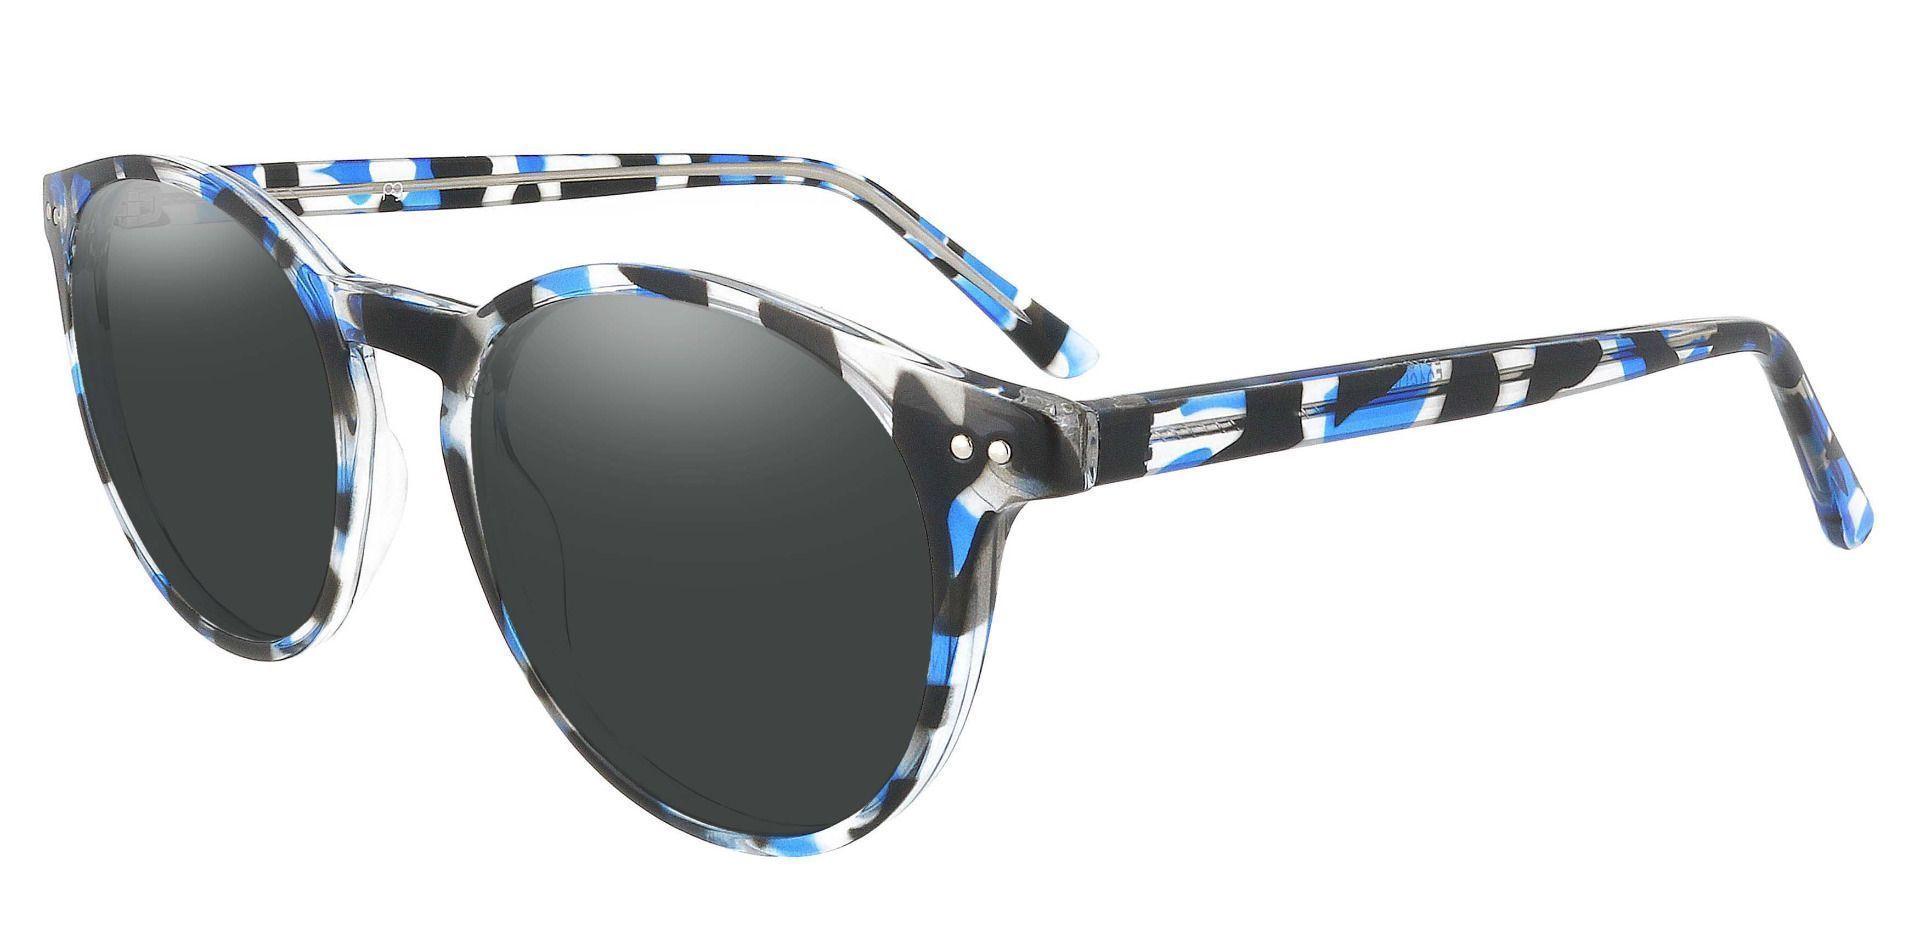 Dormont Round Prescription Sunglasses - Blue Frame With Gray Lenses